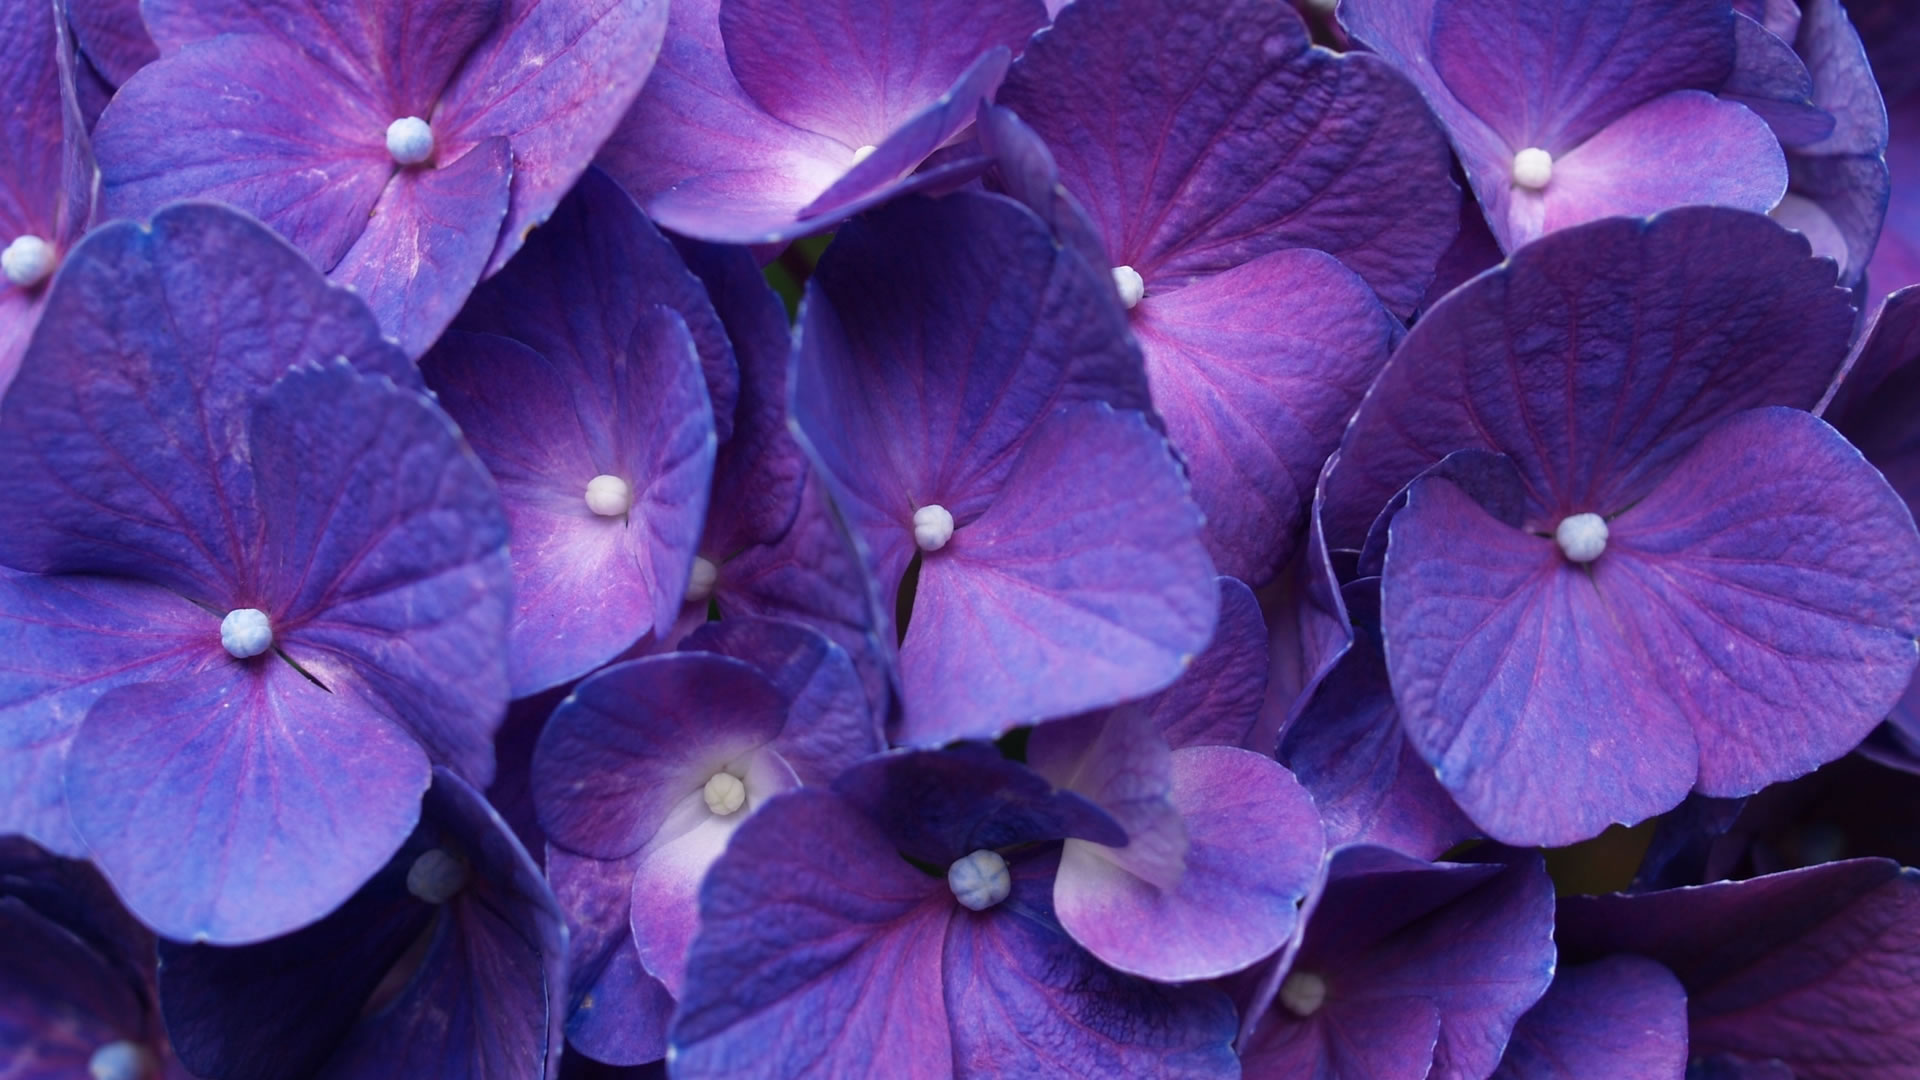 Trend Alert: Purple is the New Black!